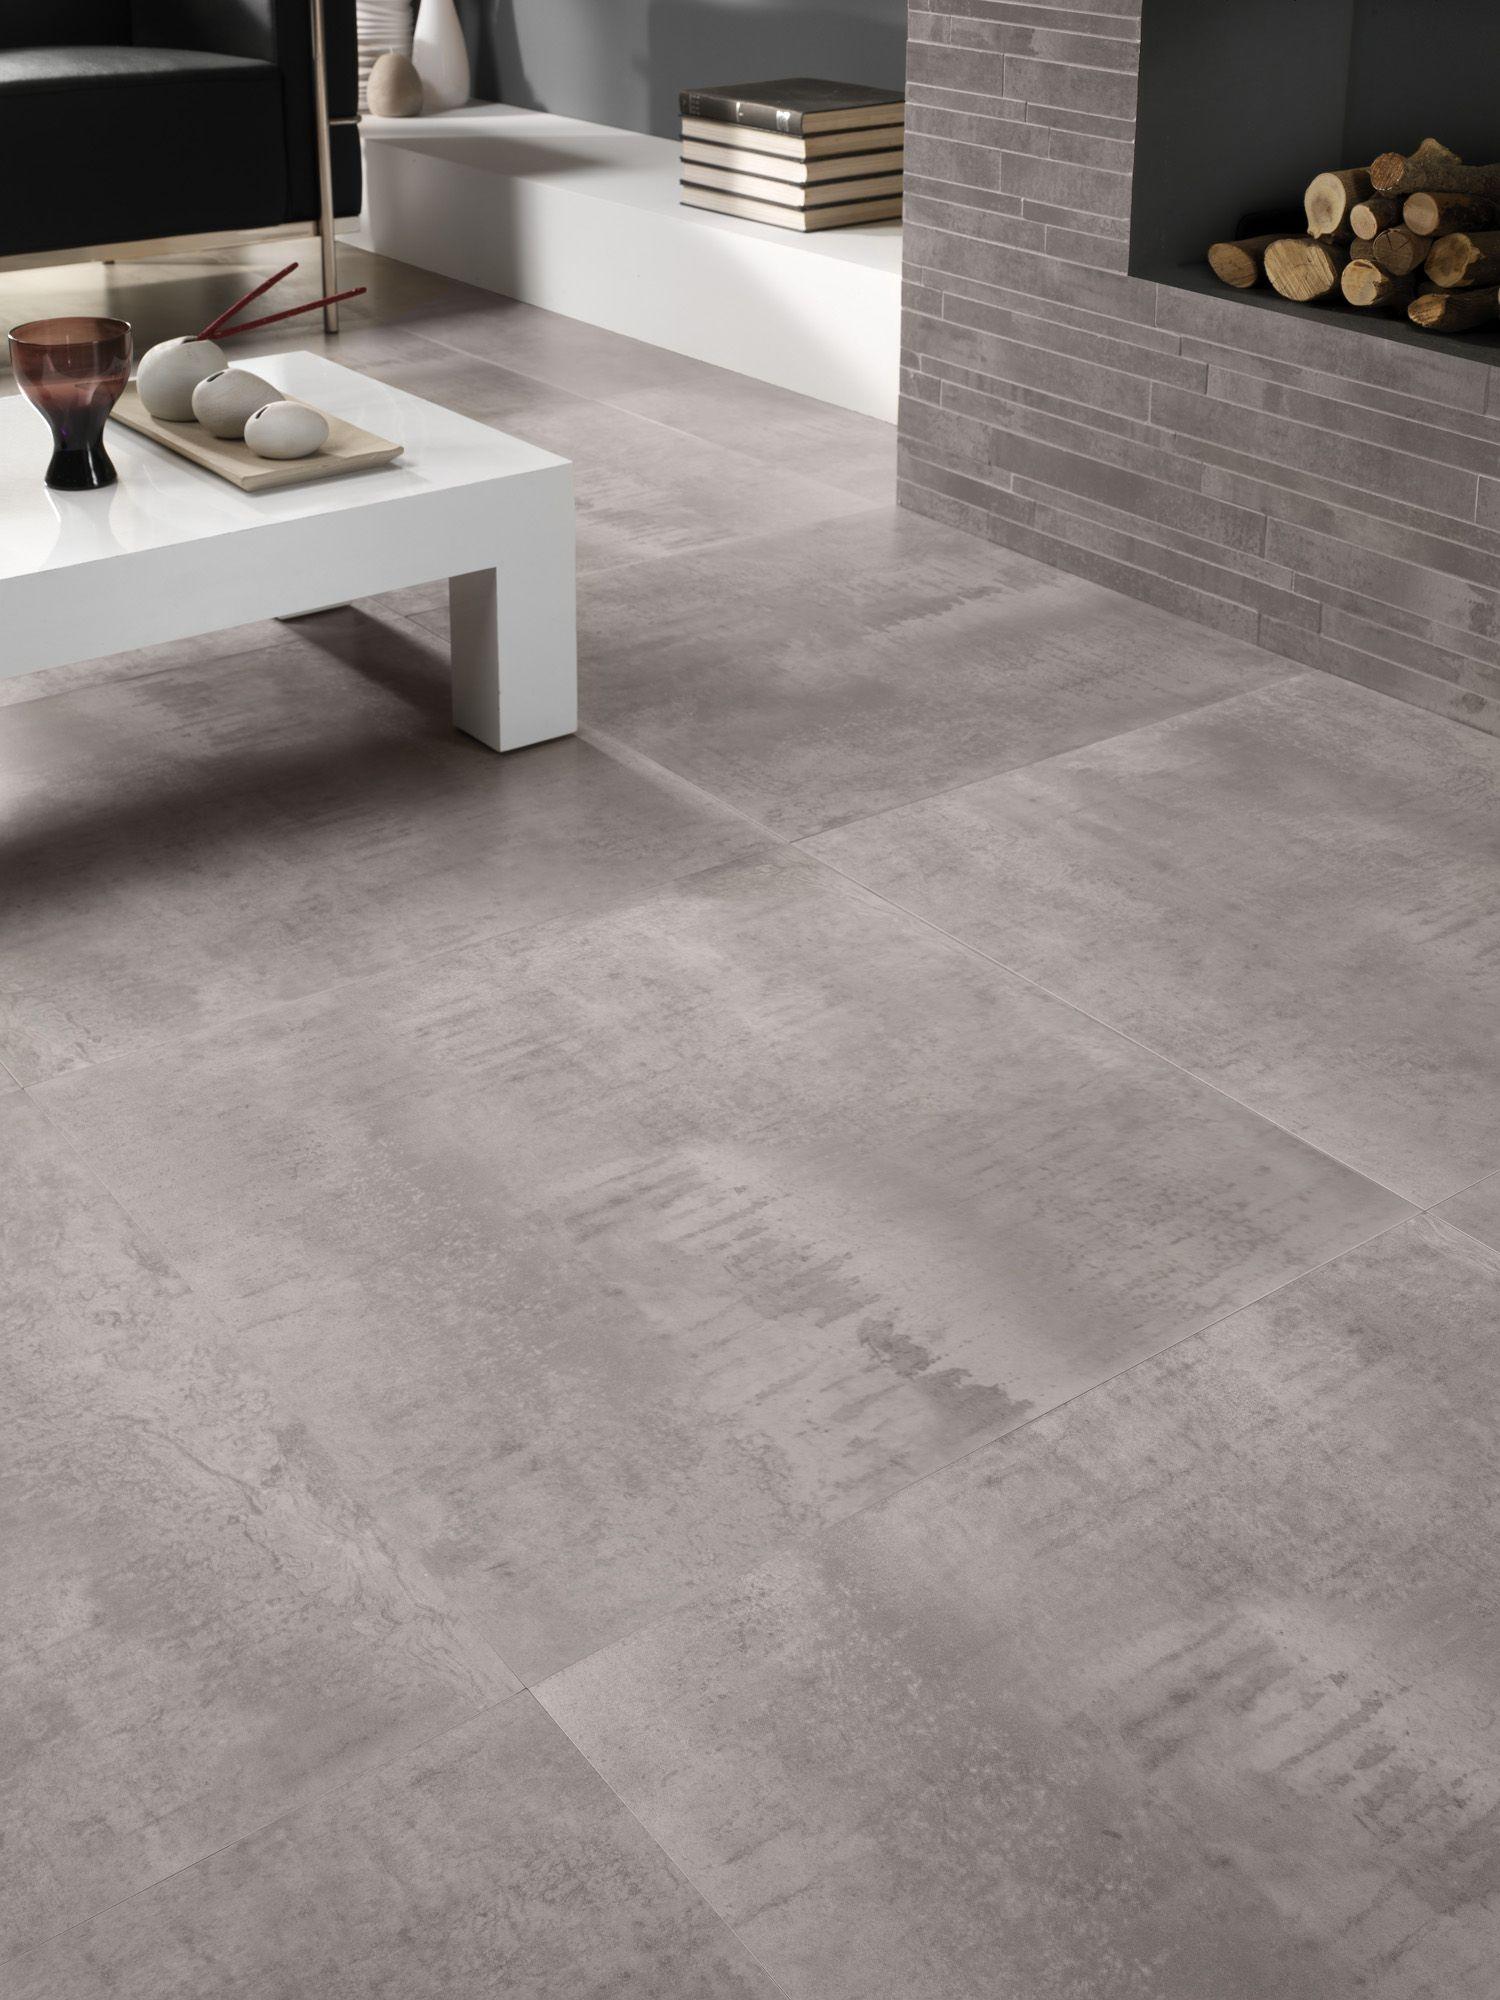 Minoli Tiles - Kursal - Grey and fashionable! Look at this new tile ...